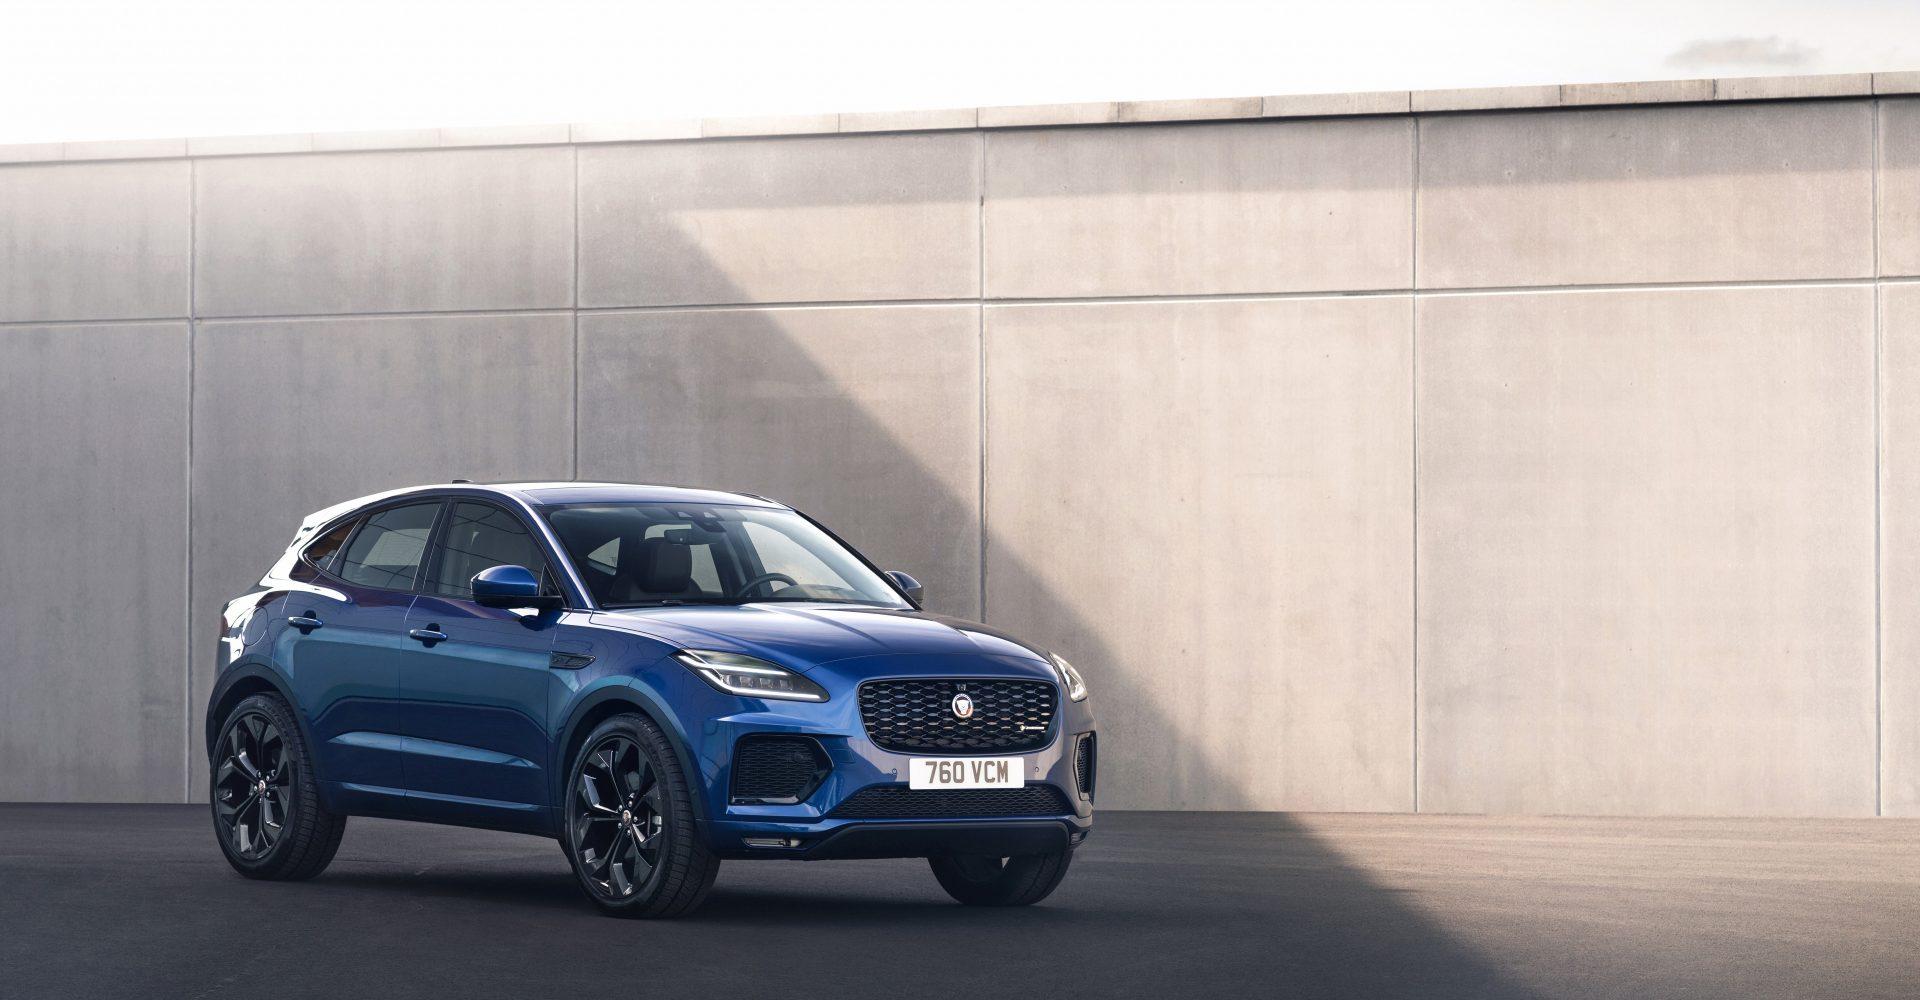 Jaguar updates E-Pace with new hybrid powertrains